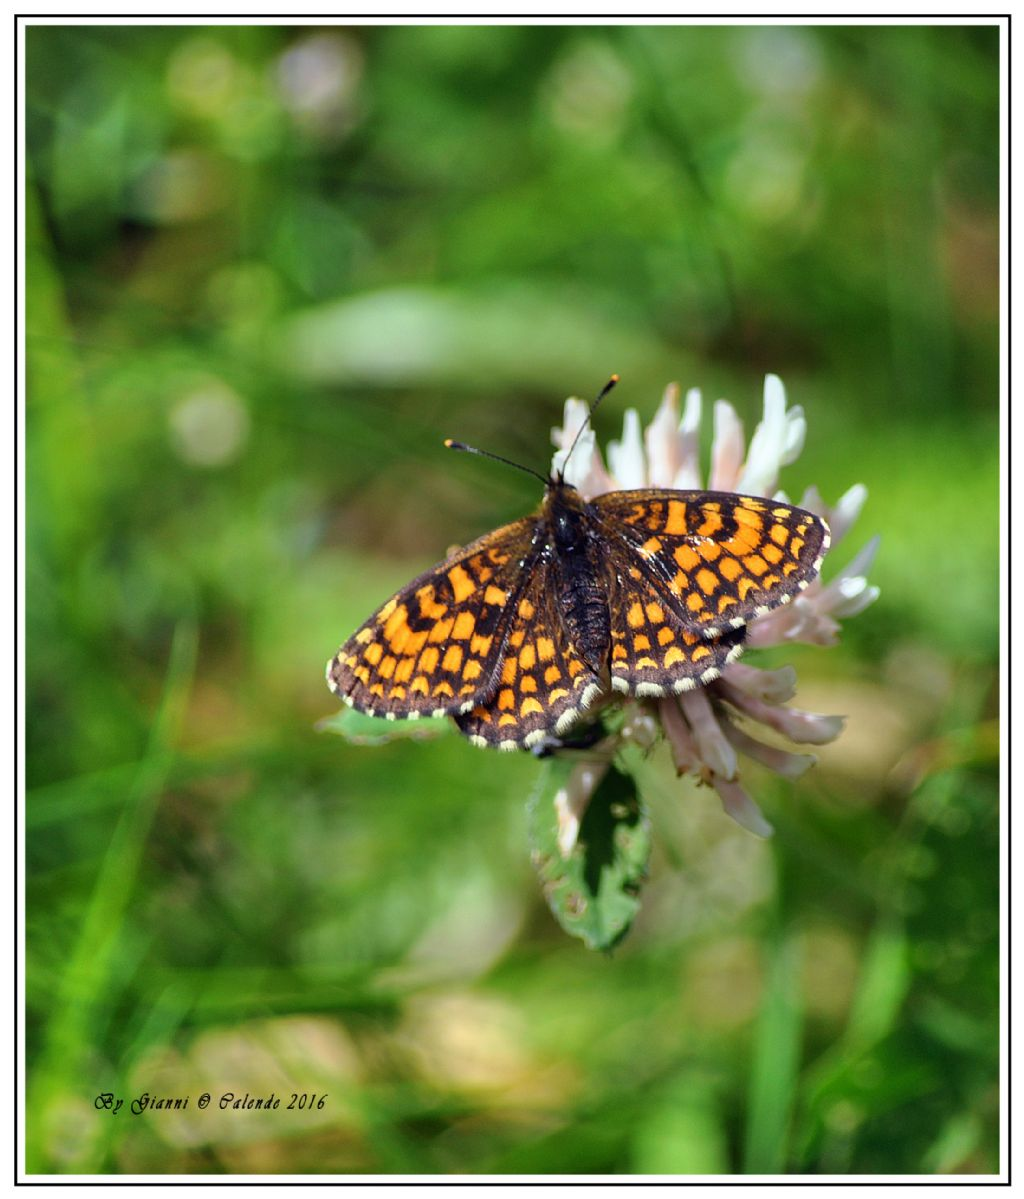 Farfalla da id - Melitaea nevadensis, Nymphalidae